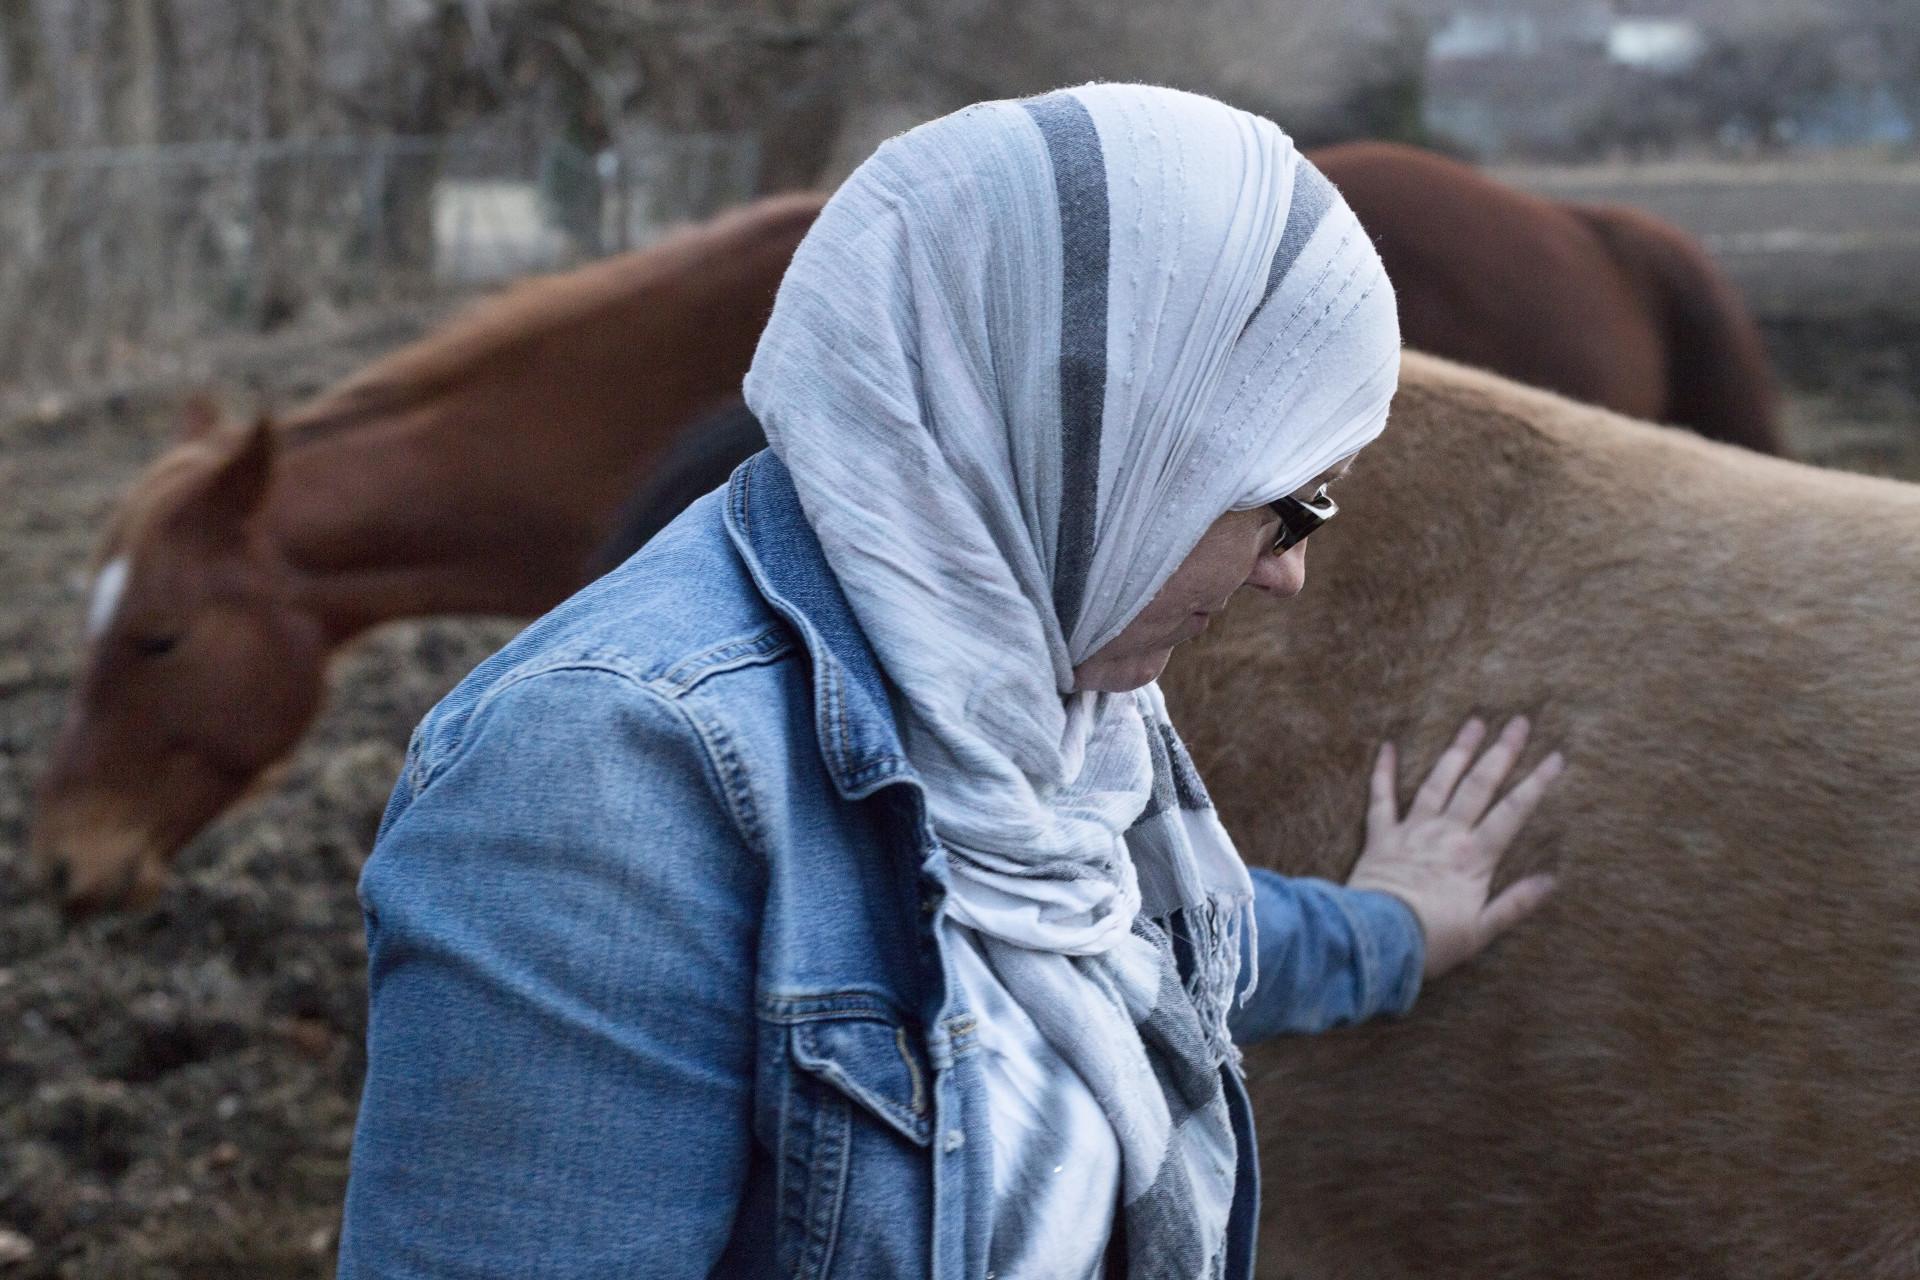 American Public Square: Muslim in the Metro